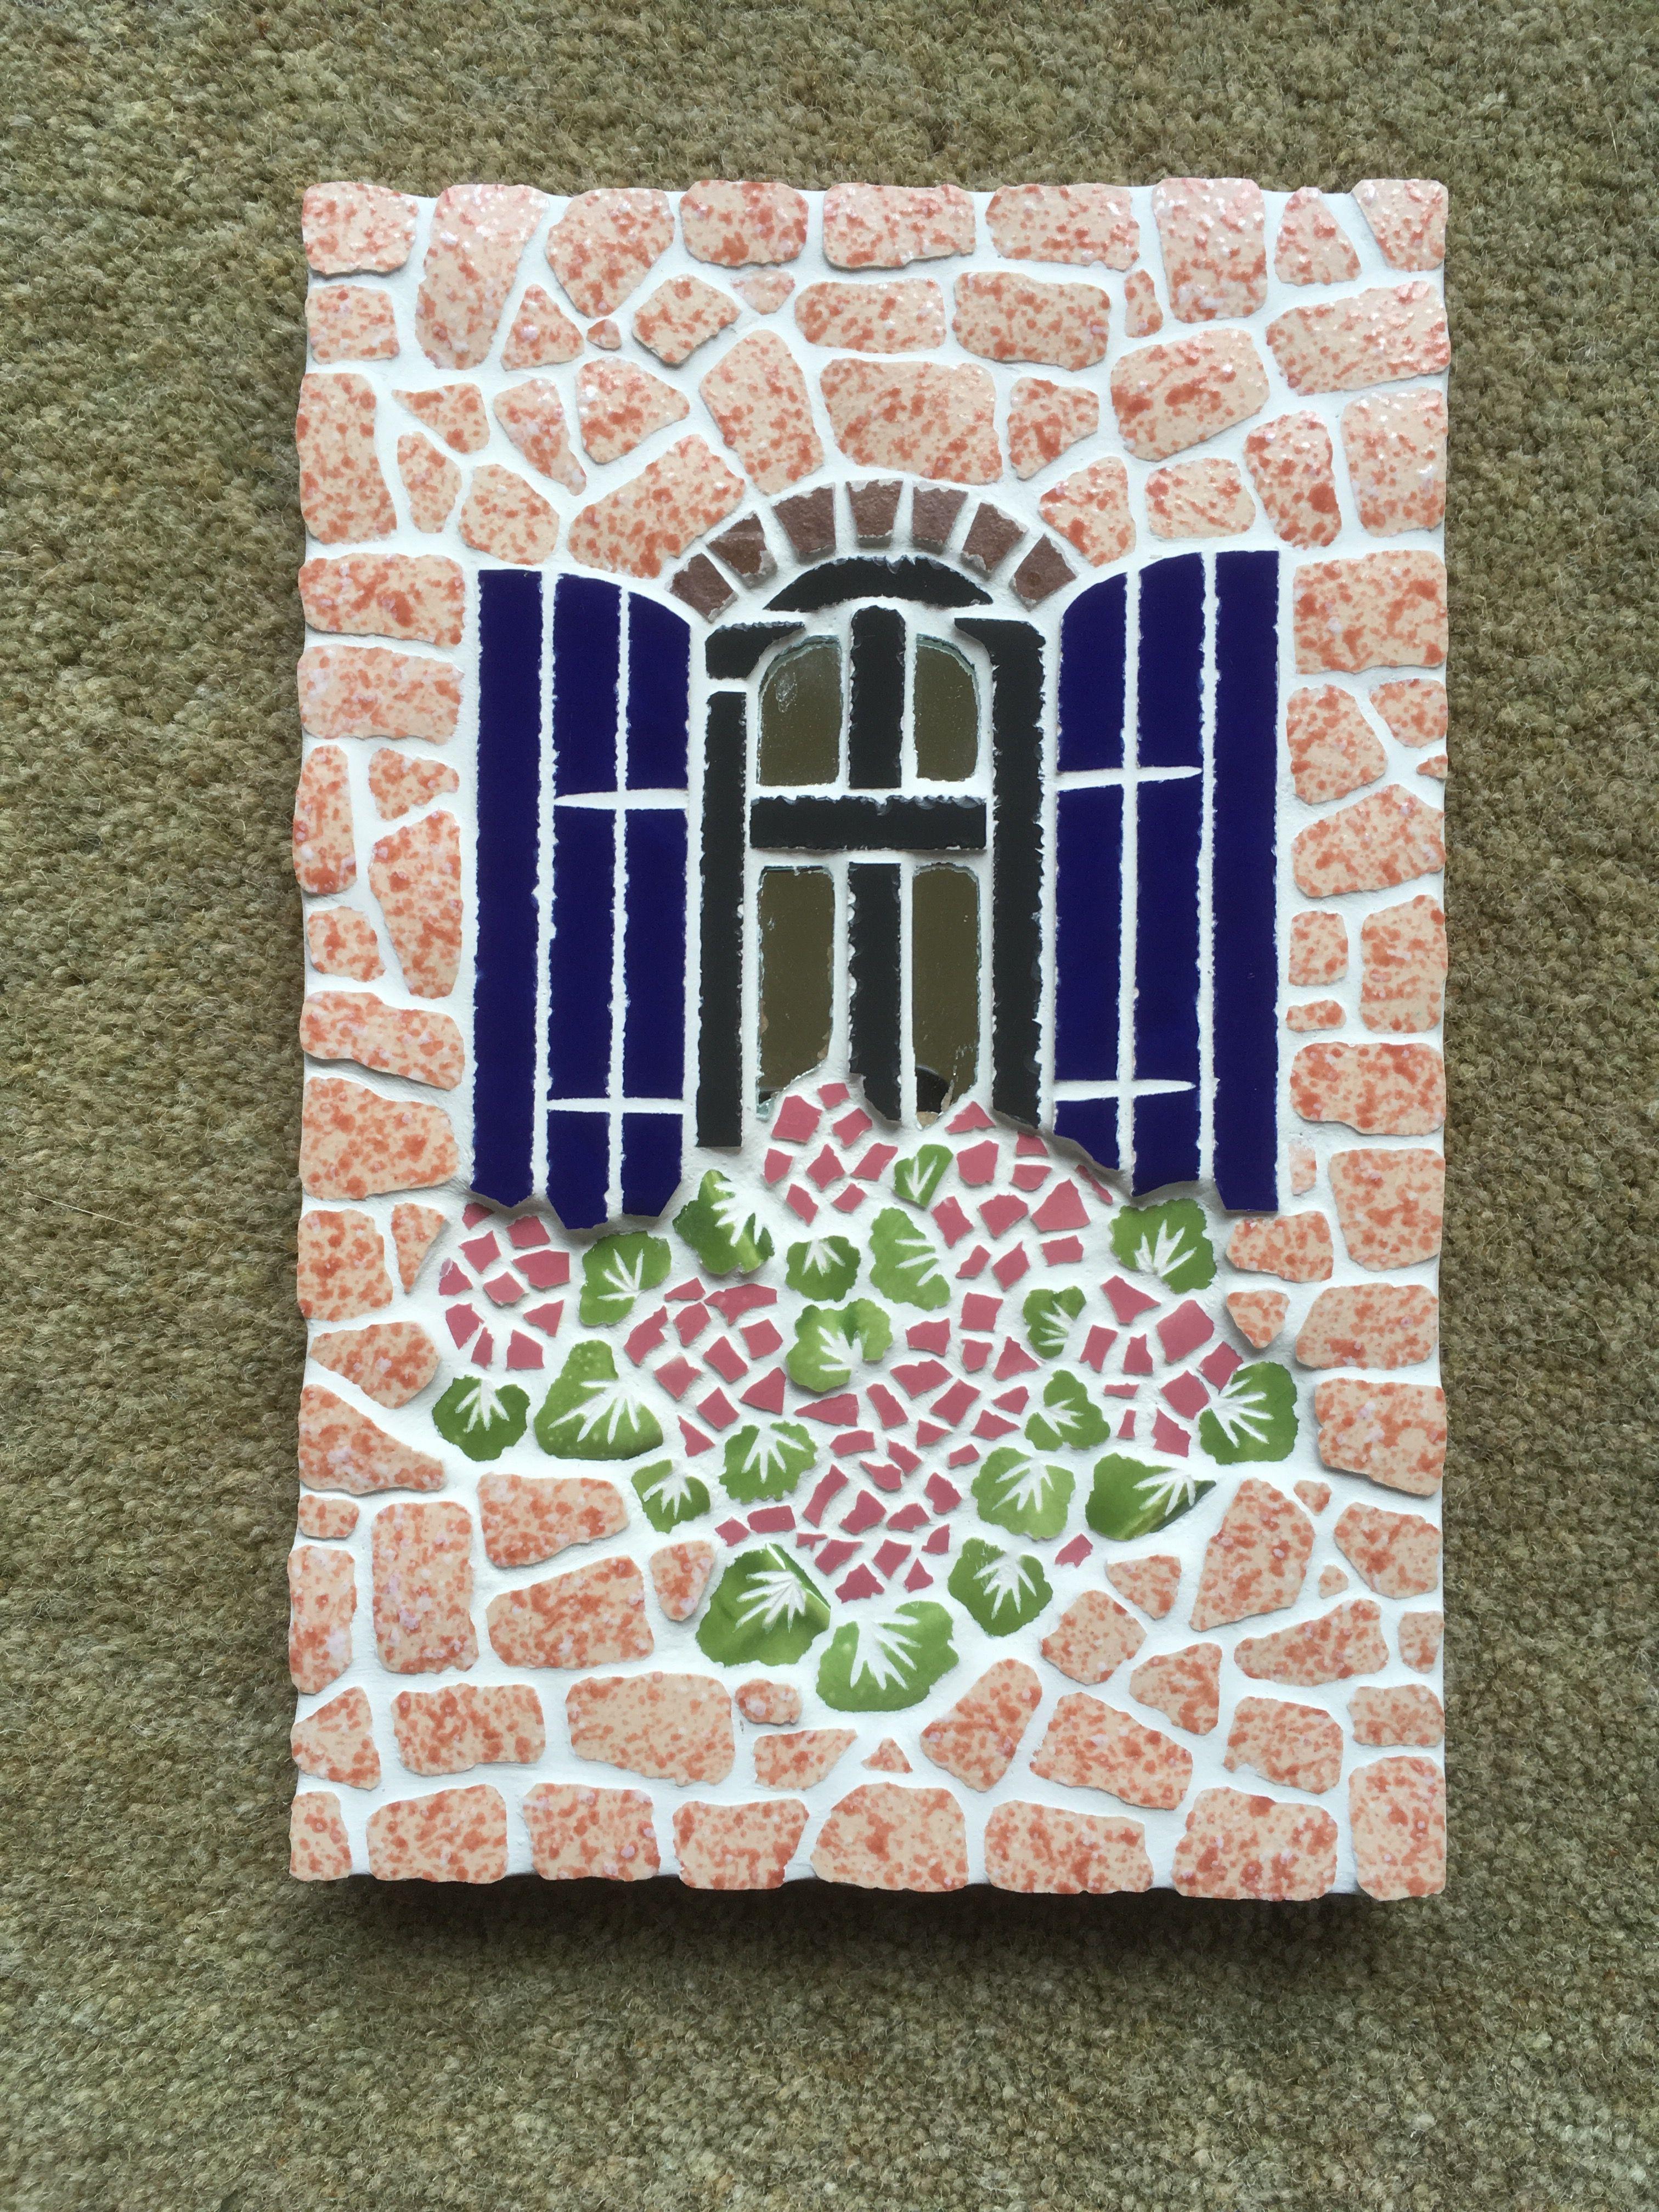 Pin by clauvrarei on Mosaics   Mosaic art, Mosaic artwork, Mosaic ...